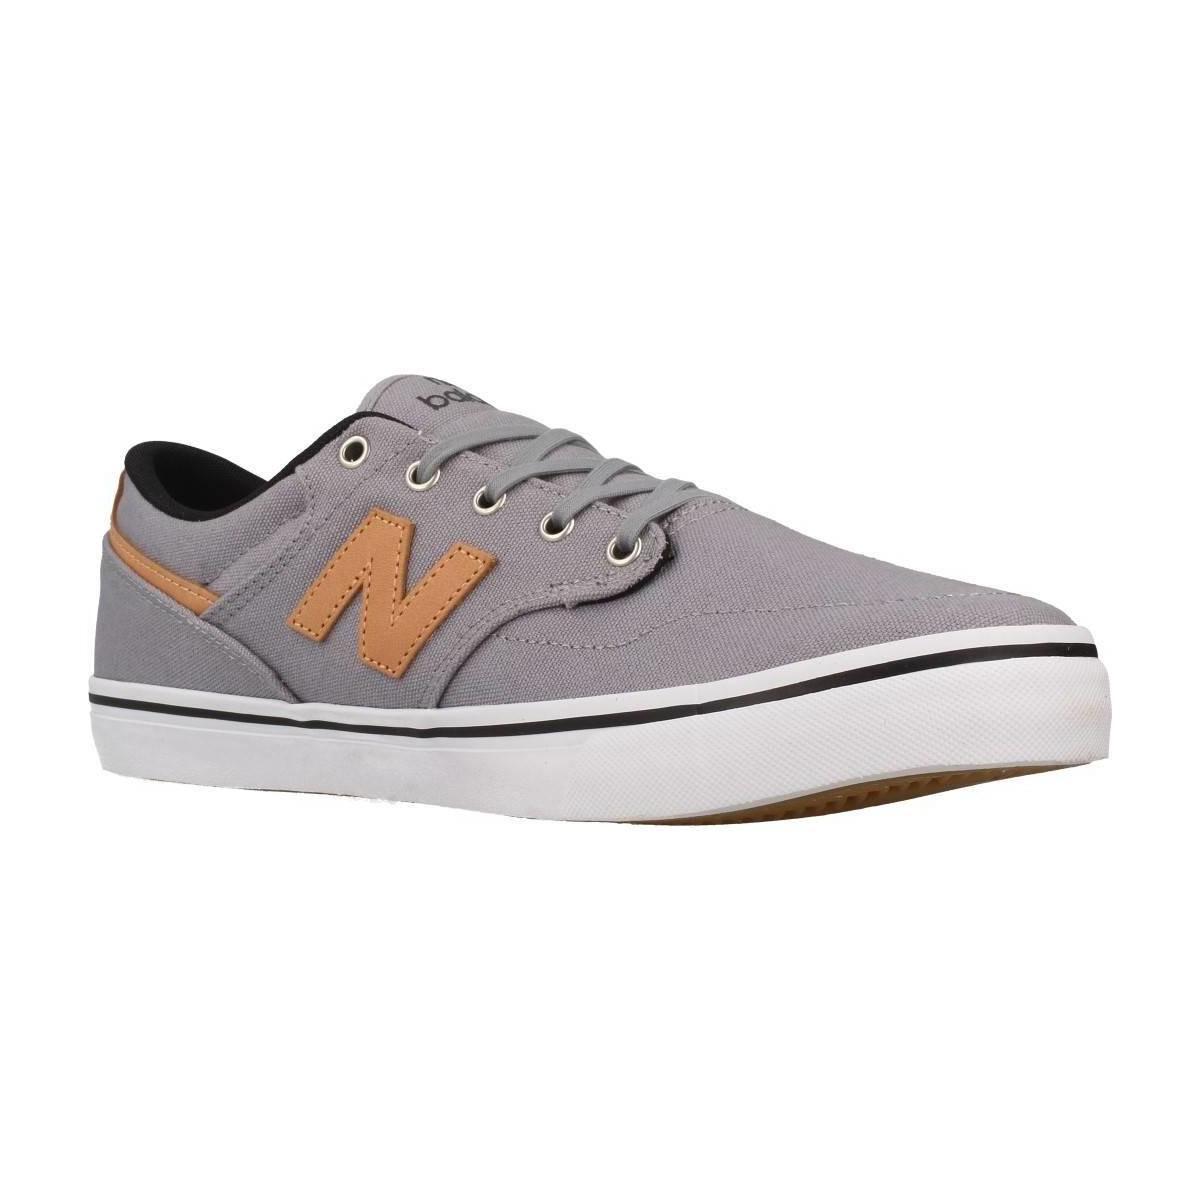 inestable Descodificar Autónomo  New Balance GGA Skate Style Men's Shoes (trainers) In Grey in Gray ...